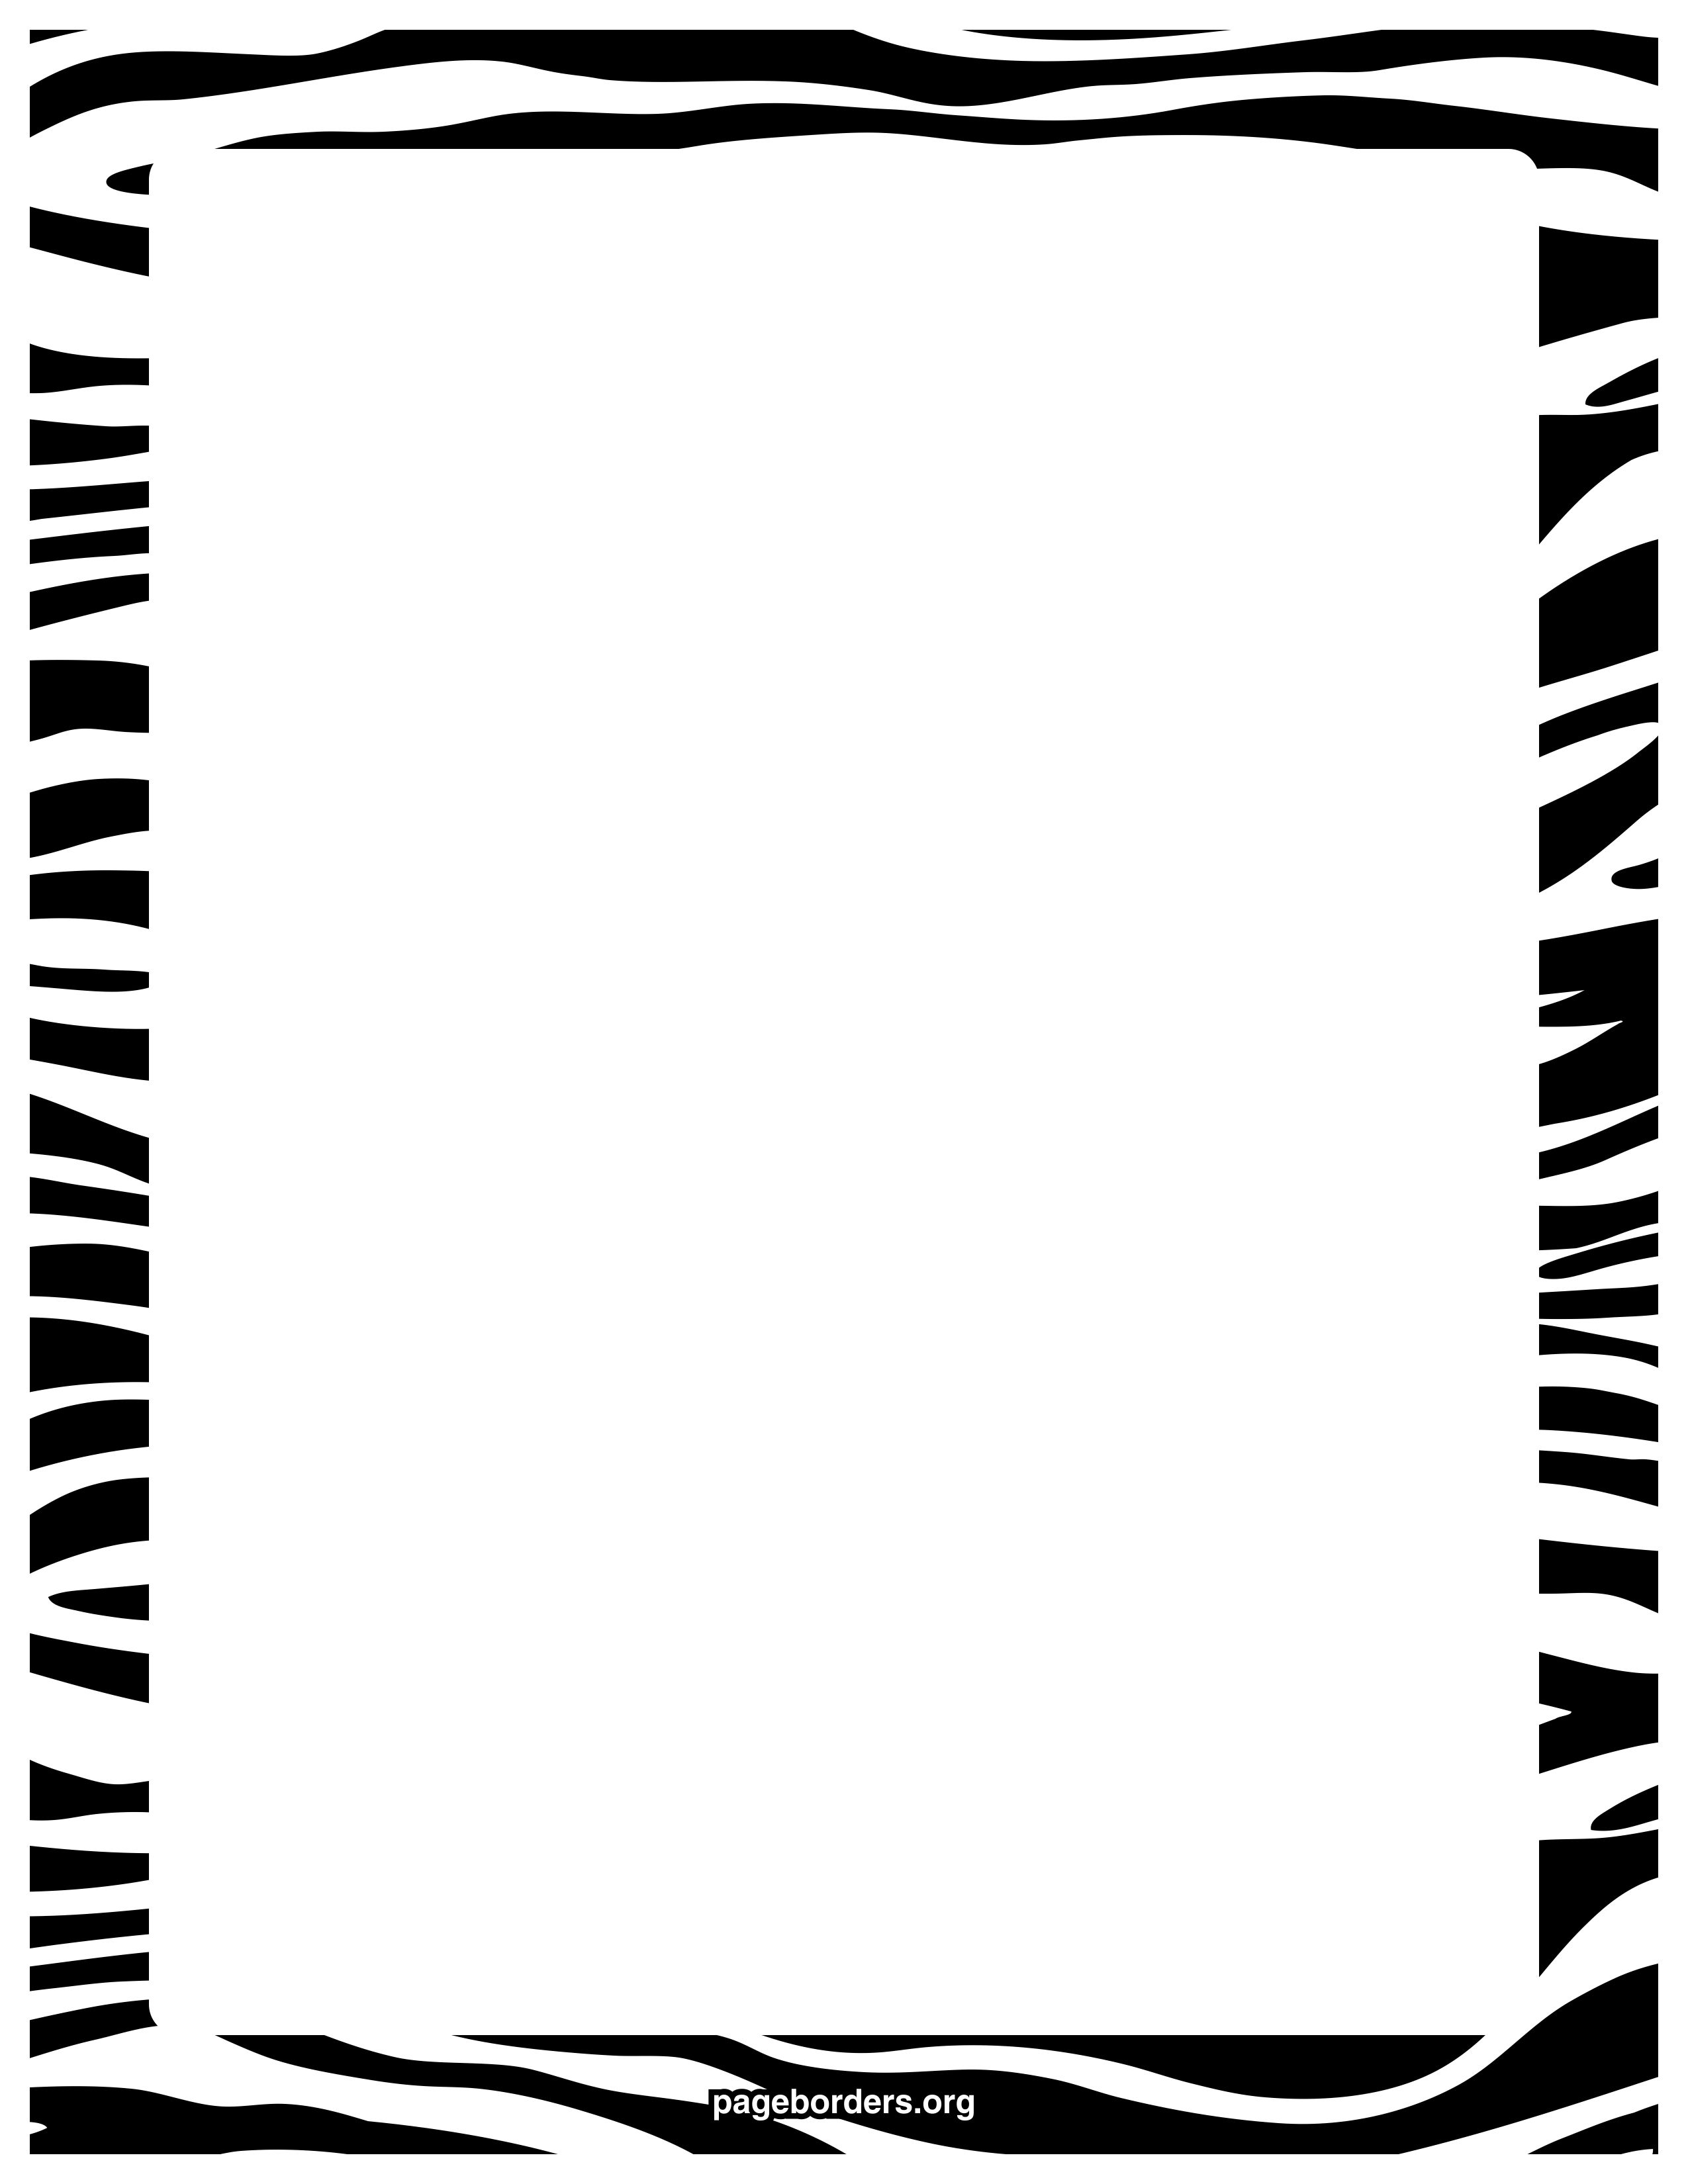 Zebra print border watermarkedg 25503300 pixels crafts free zebra print border templates including printable border paper and clip art versions toneelgroepblik Gallery